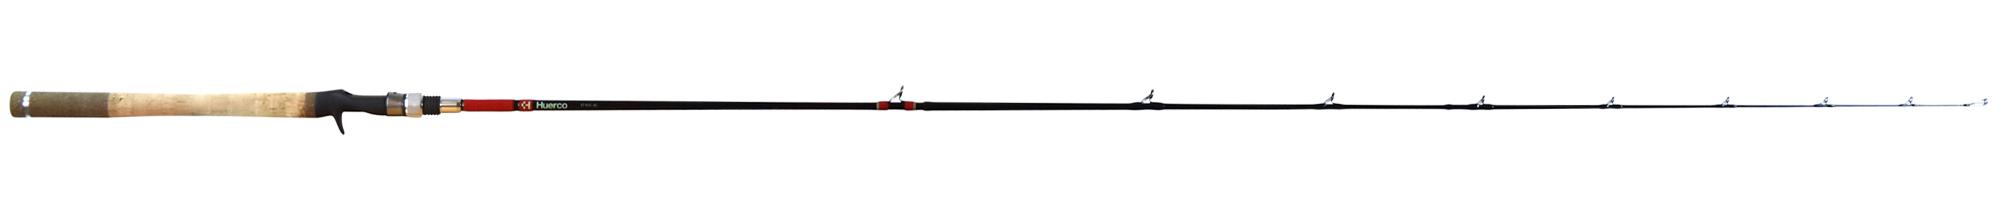 Huerco Huerco XT610-4C Detail01